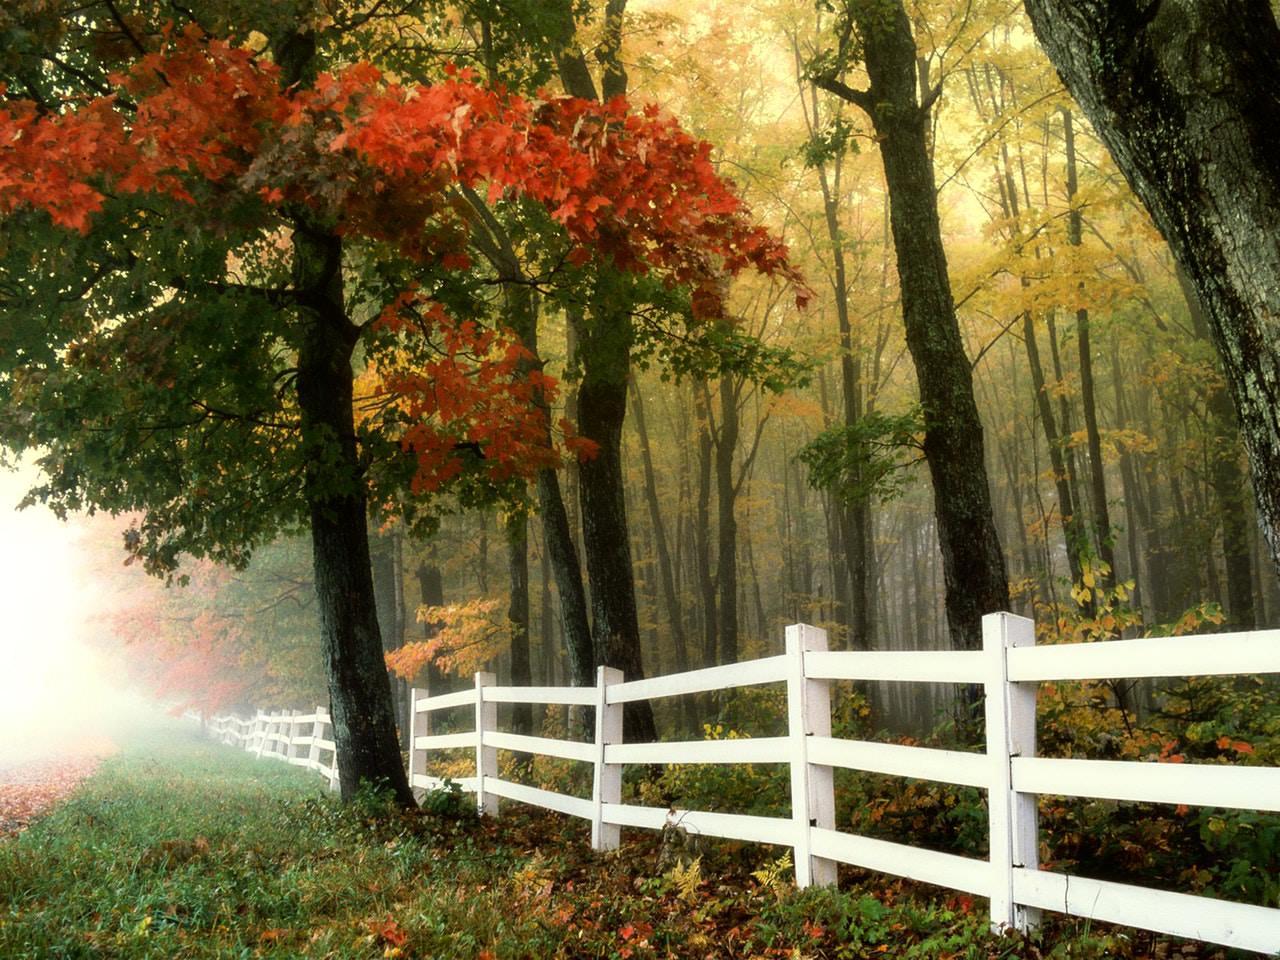 Fence Autumn.jpeg